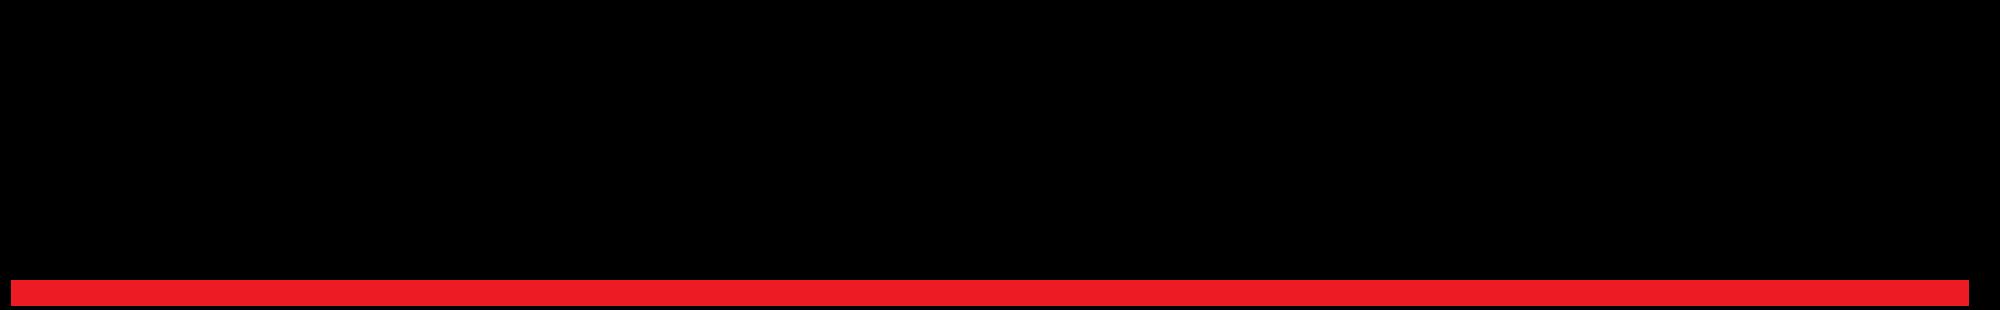 2000px-politiken_newspaper_logo-svg